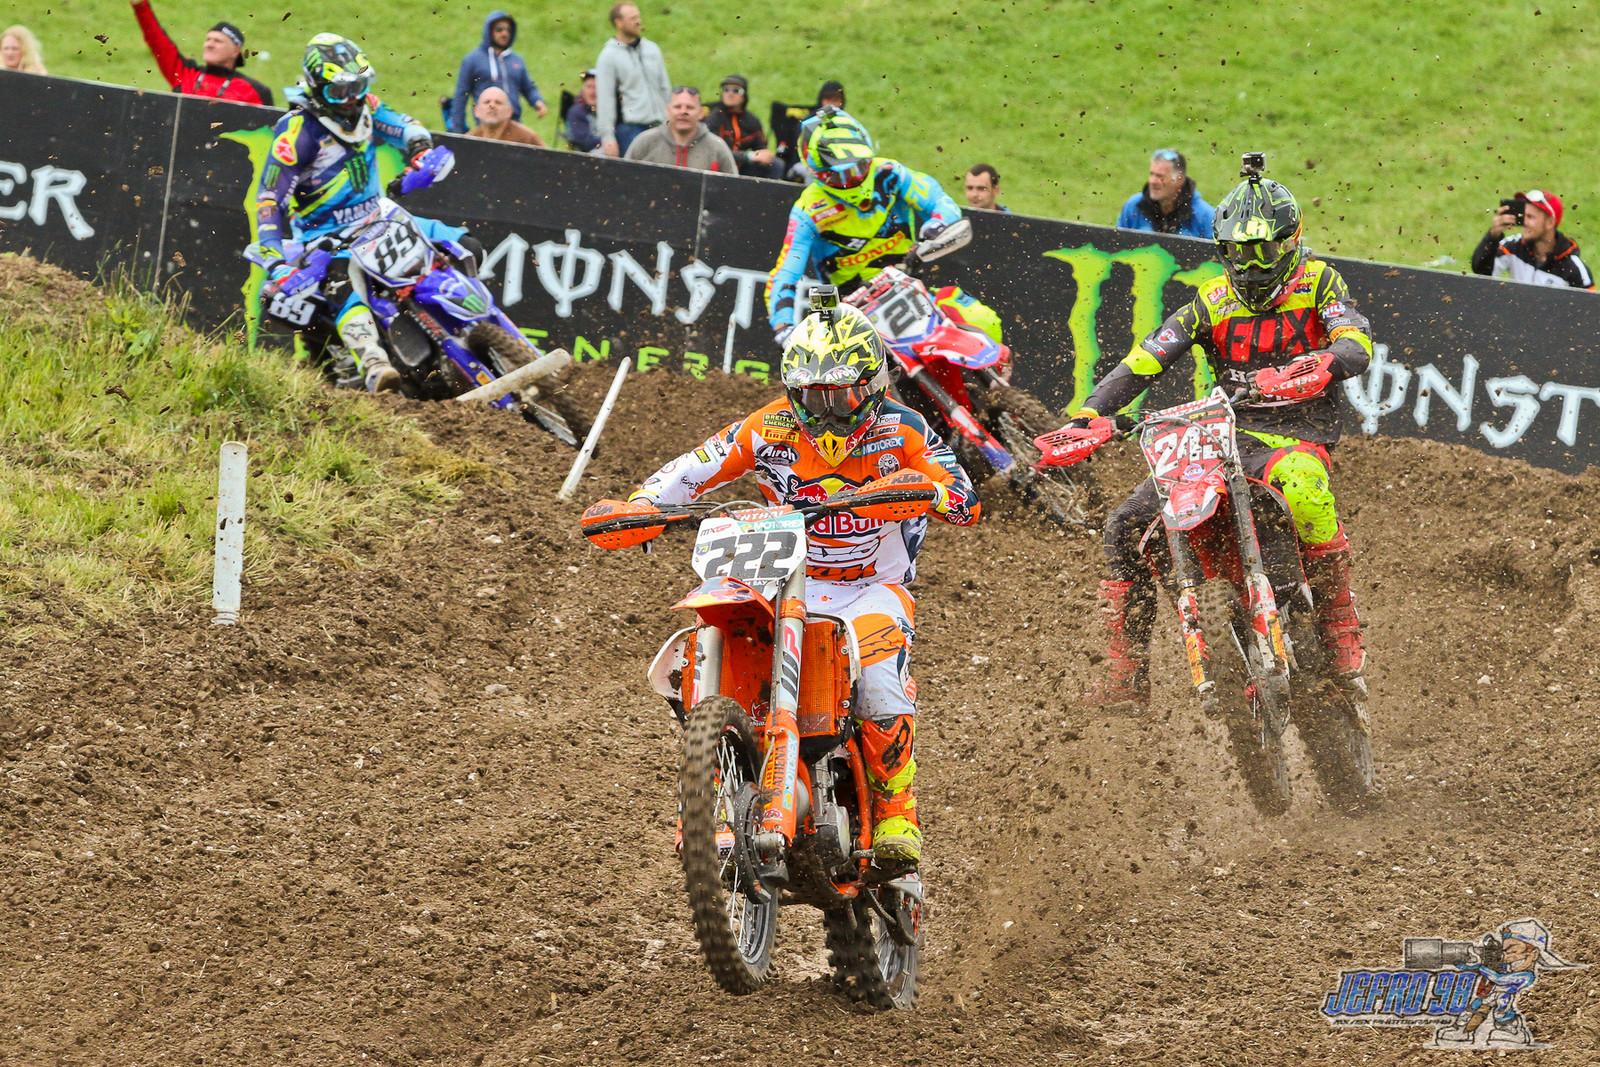 Toni Cairoli - Photo Gallery: MXGP of Great Britain - Motocross Pictures - Vital MX